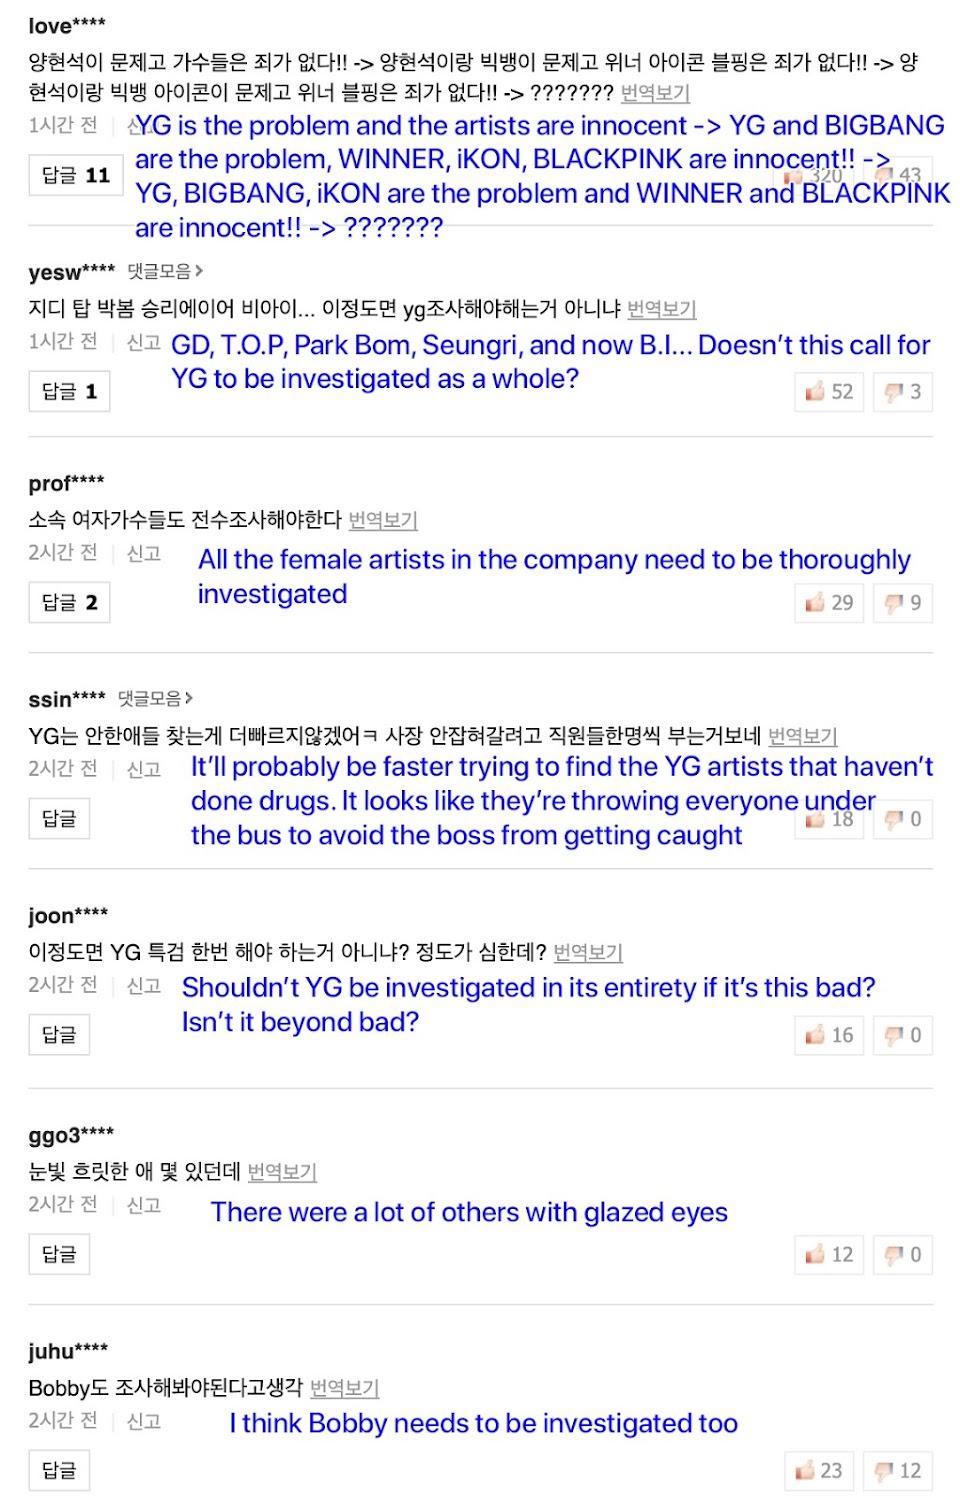 ikon bi netizen yg artists